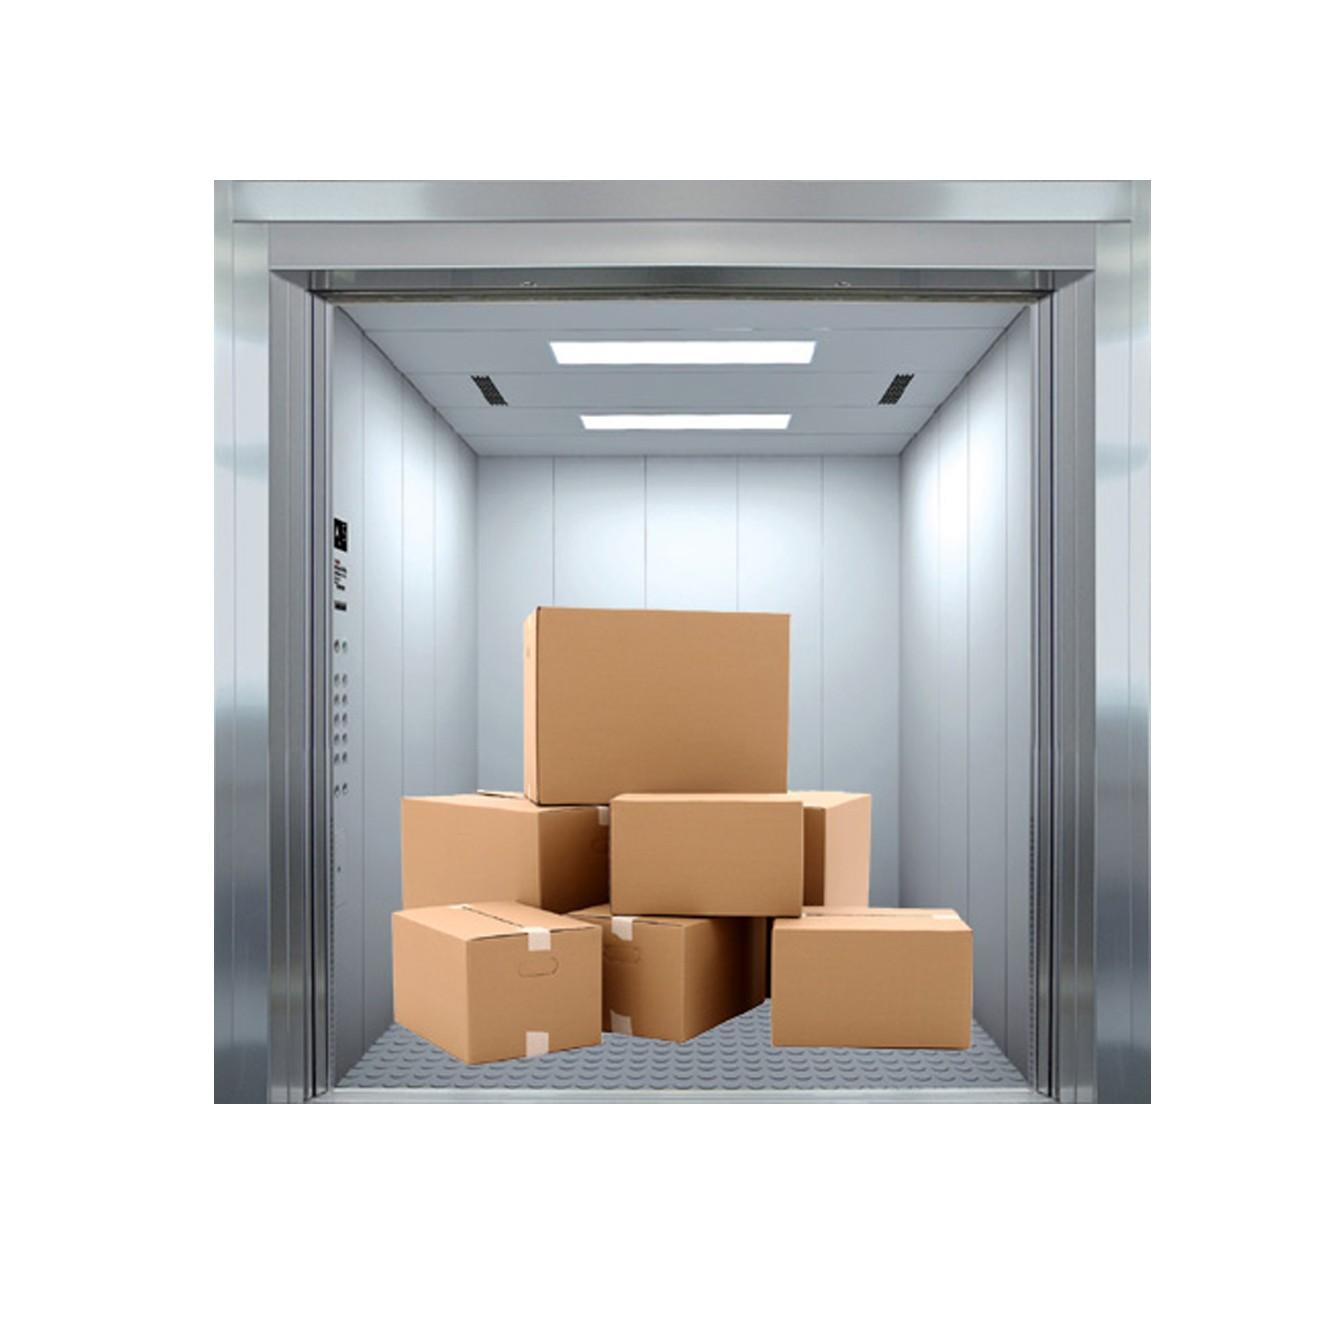 FUJIZY cargo elevator with high quality